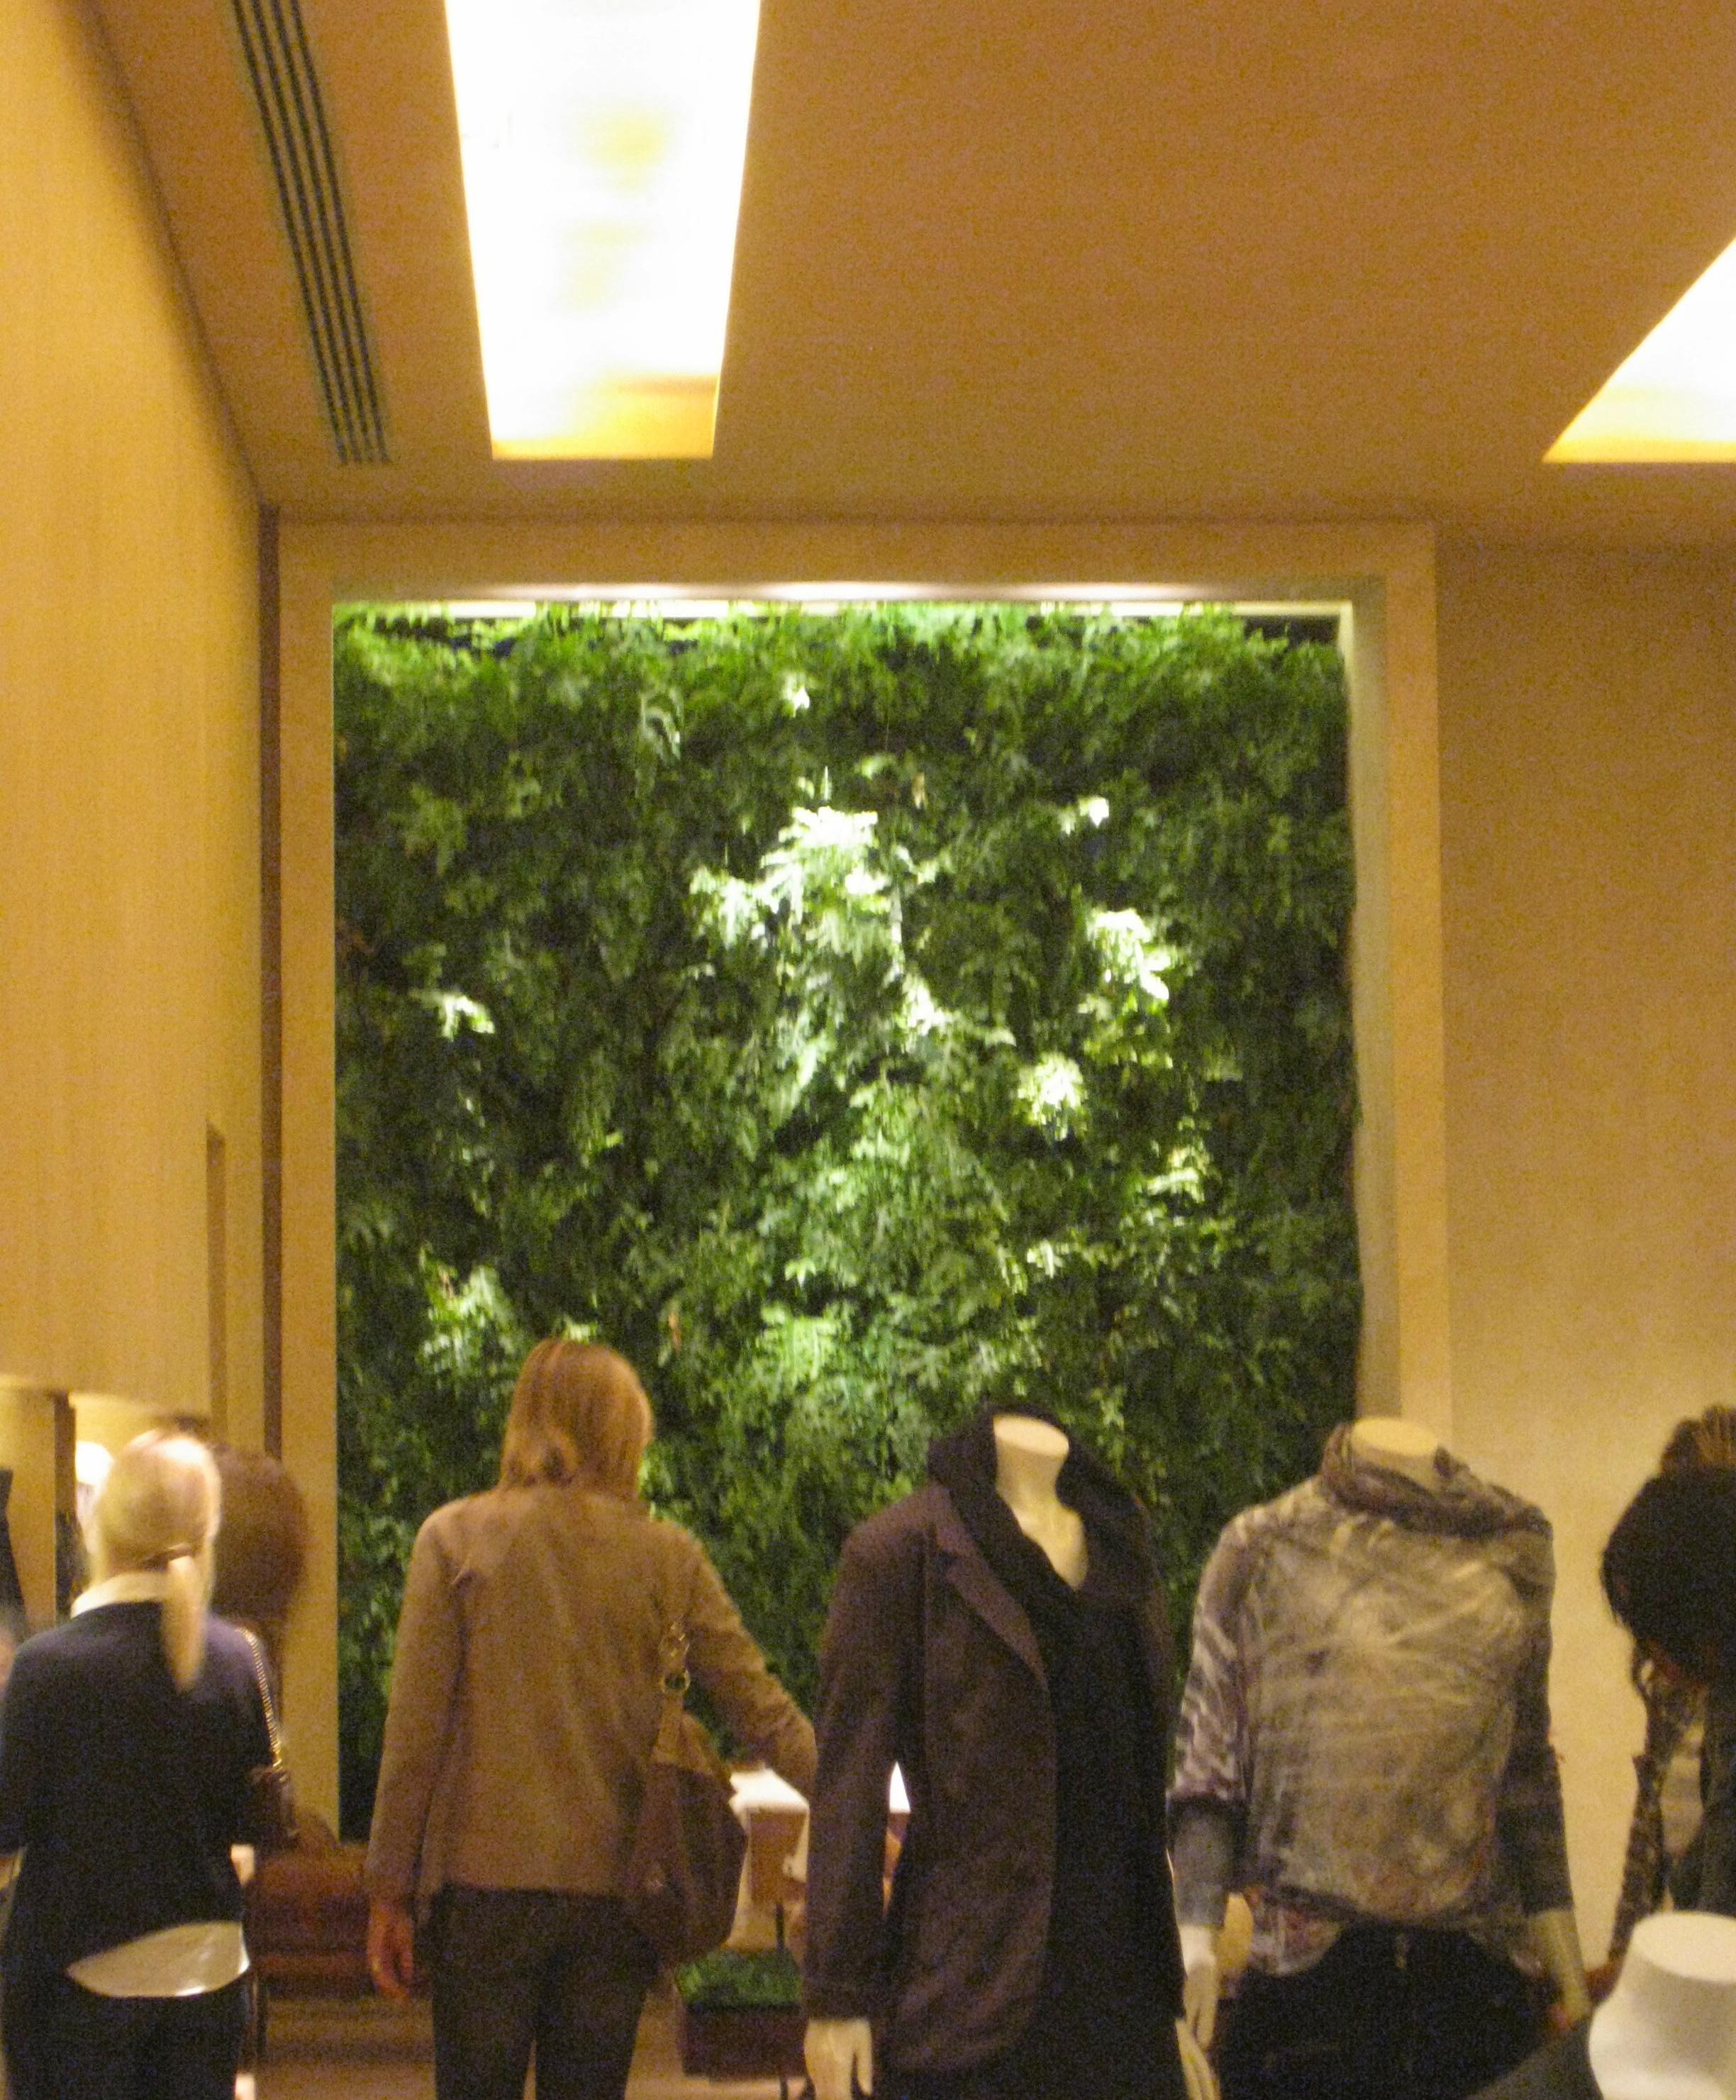 jardim vertical sacada:Jardim vertical na Loja Sacada na Oscar Freire, comprova o